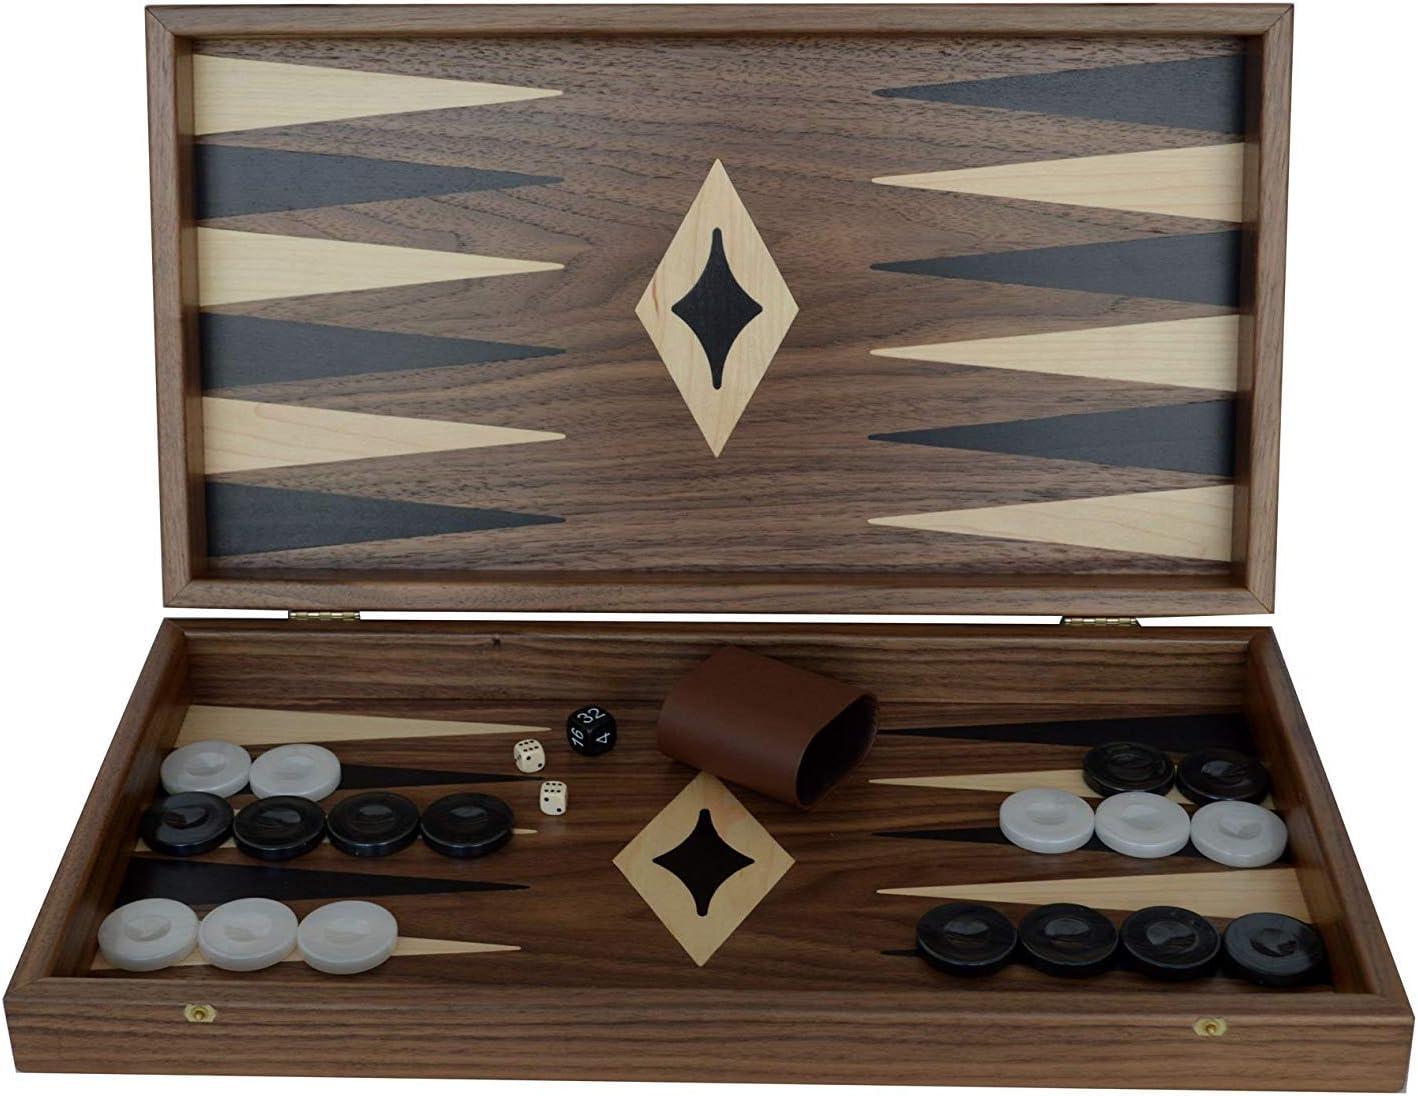 Manopoulos Traditional Walnut Wood Backgammon Set - Handmade in Greece